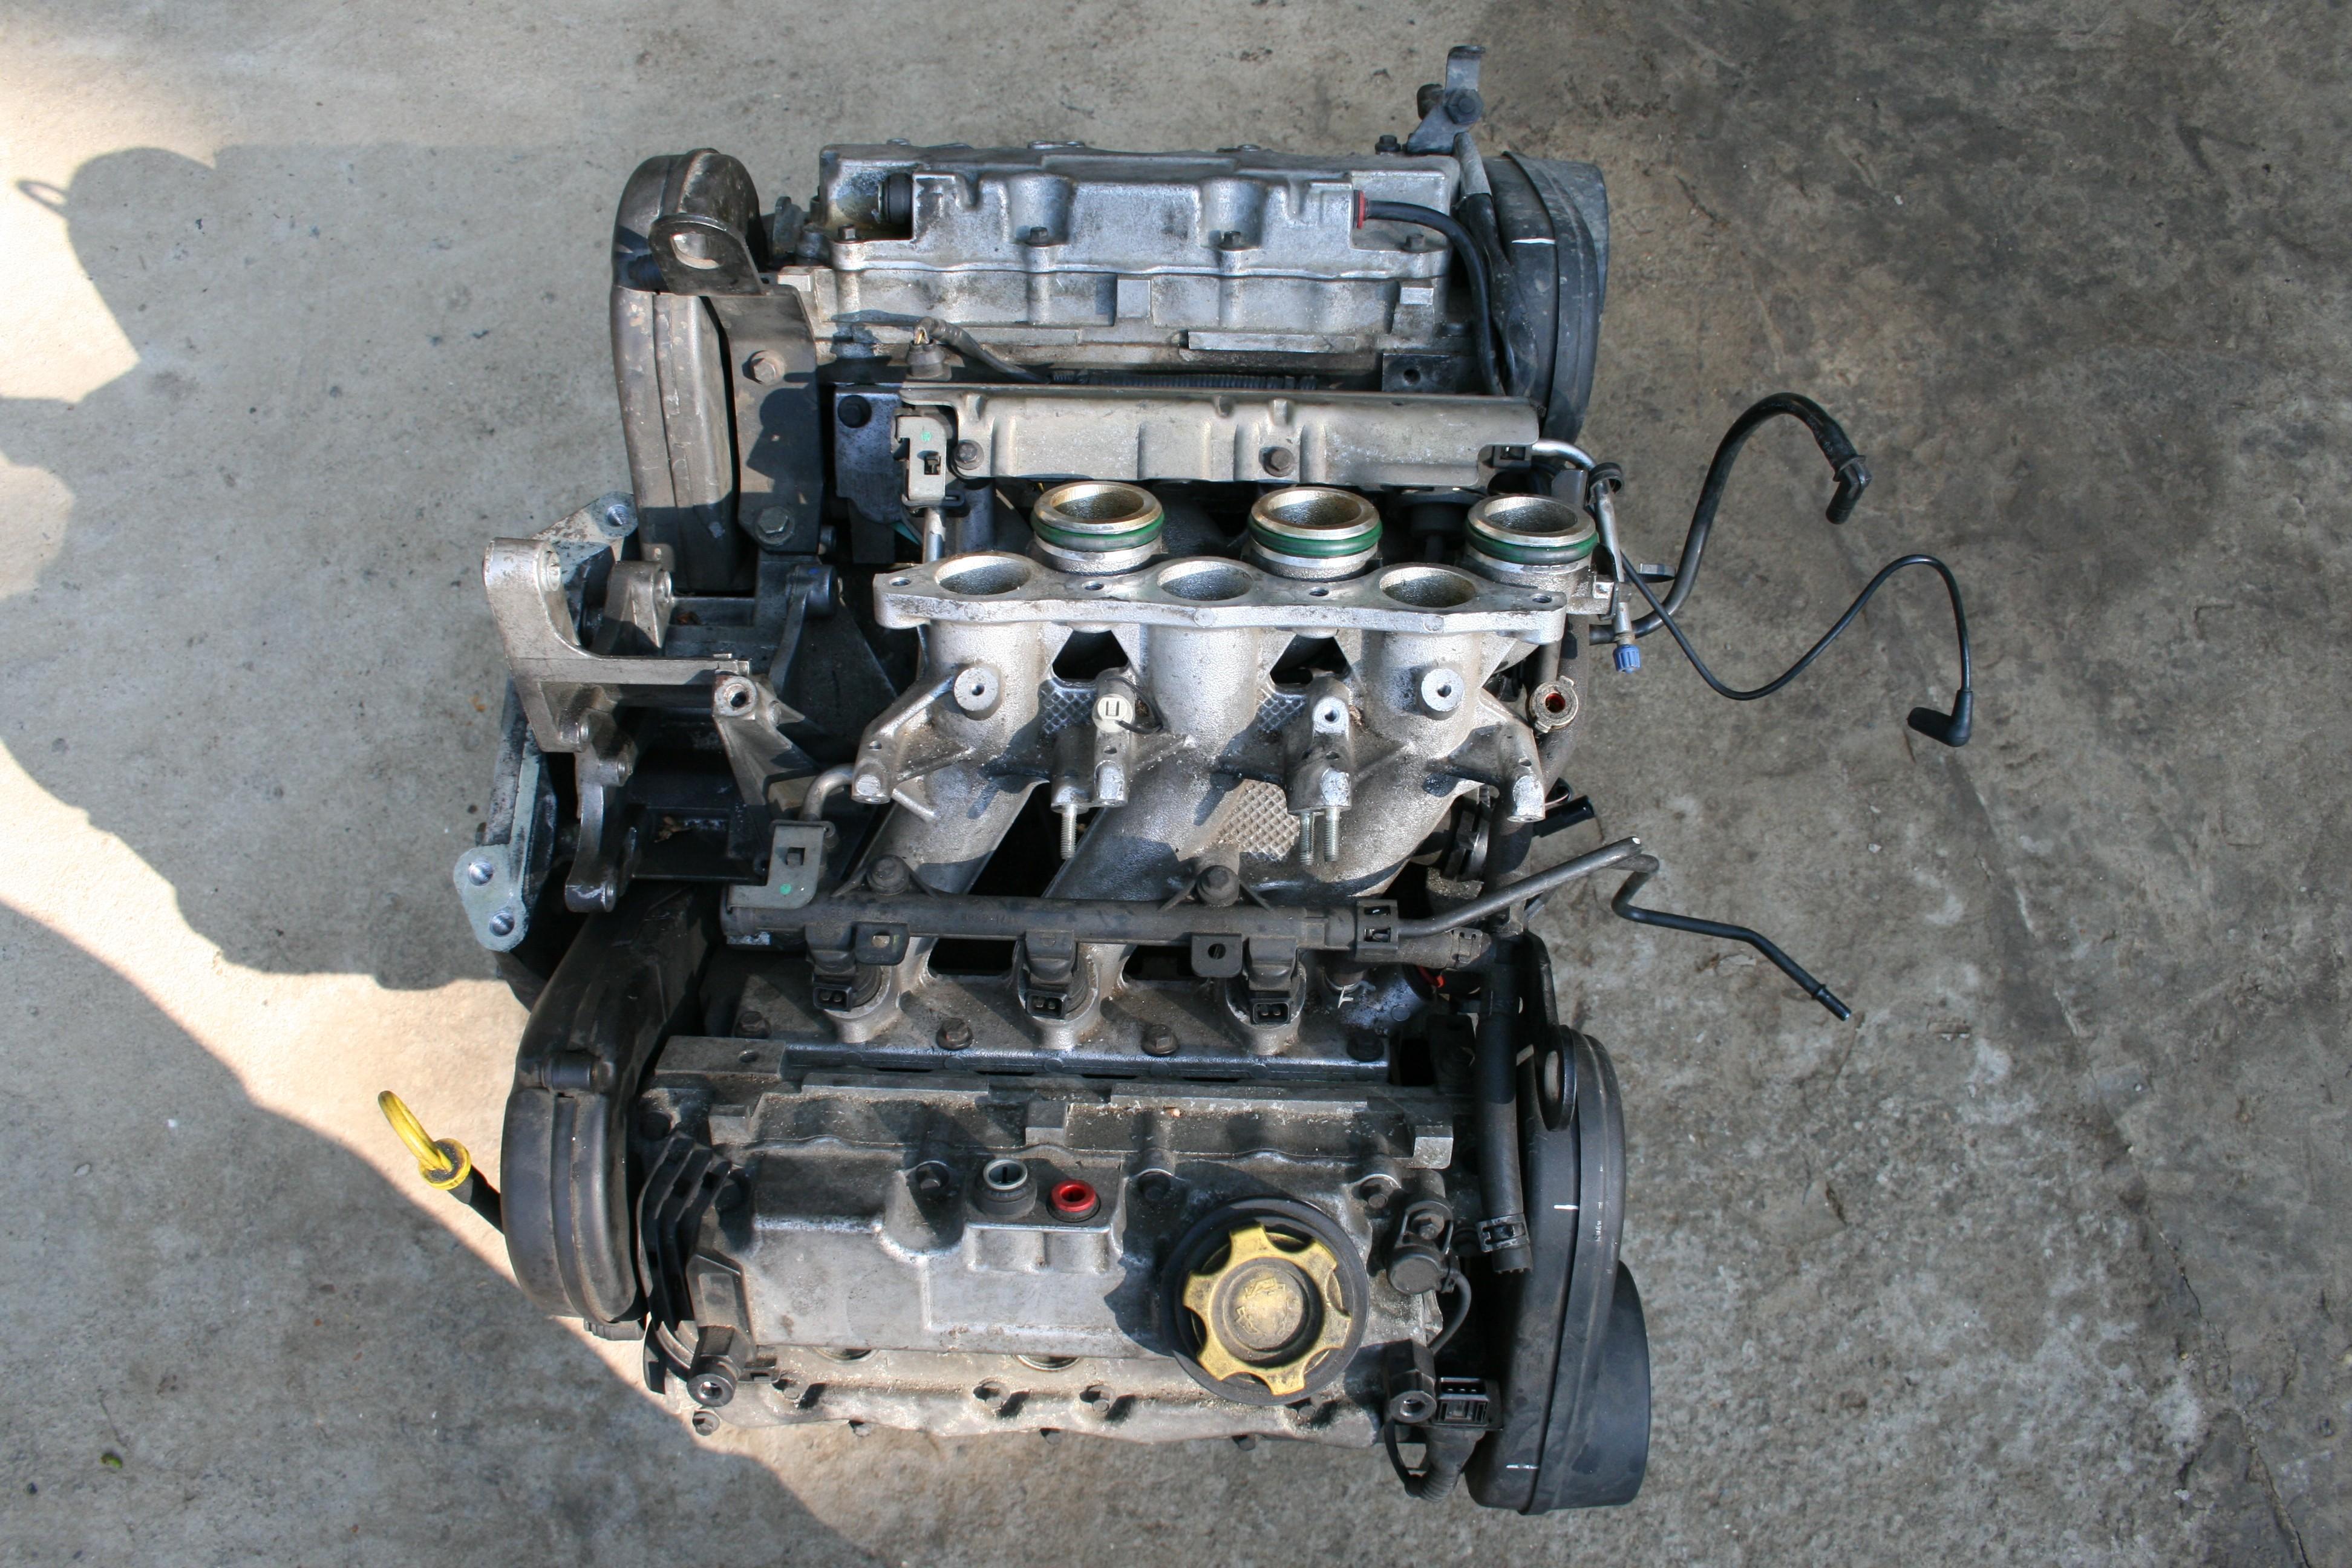 2002 land rover freelander engine diagram starter motor removal 2001 rh detoxicrecenze com Land Rover Freelander 2 Land Rover Freelander Off-Road